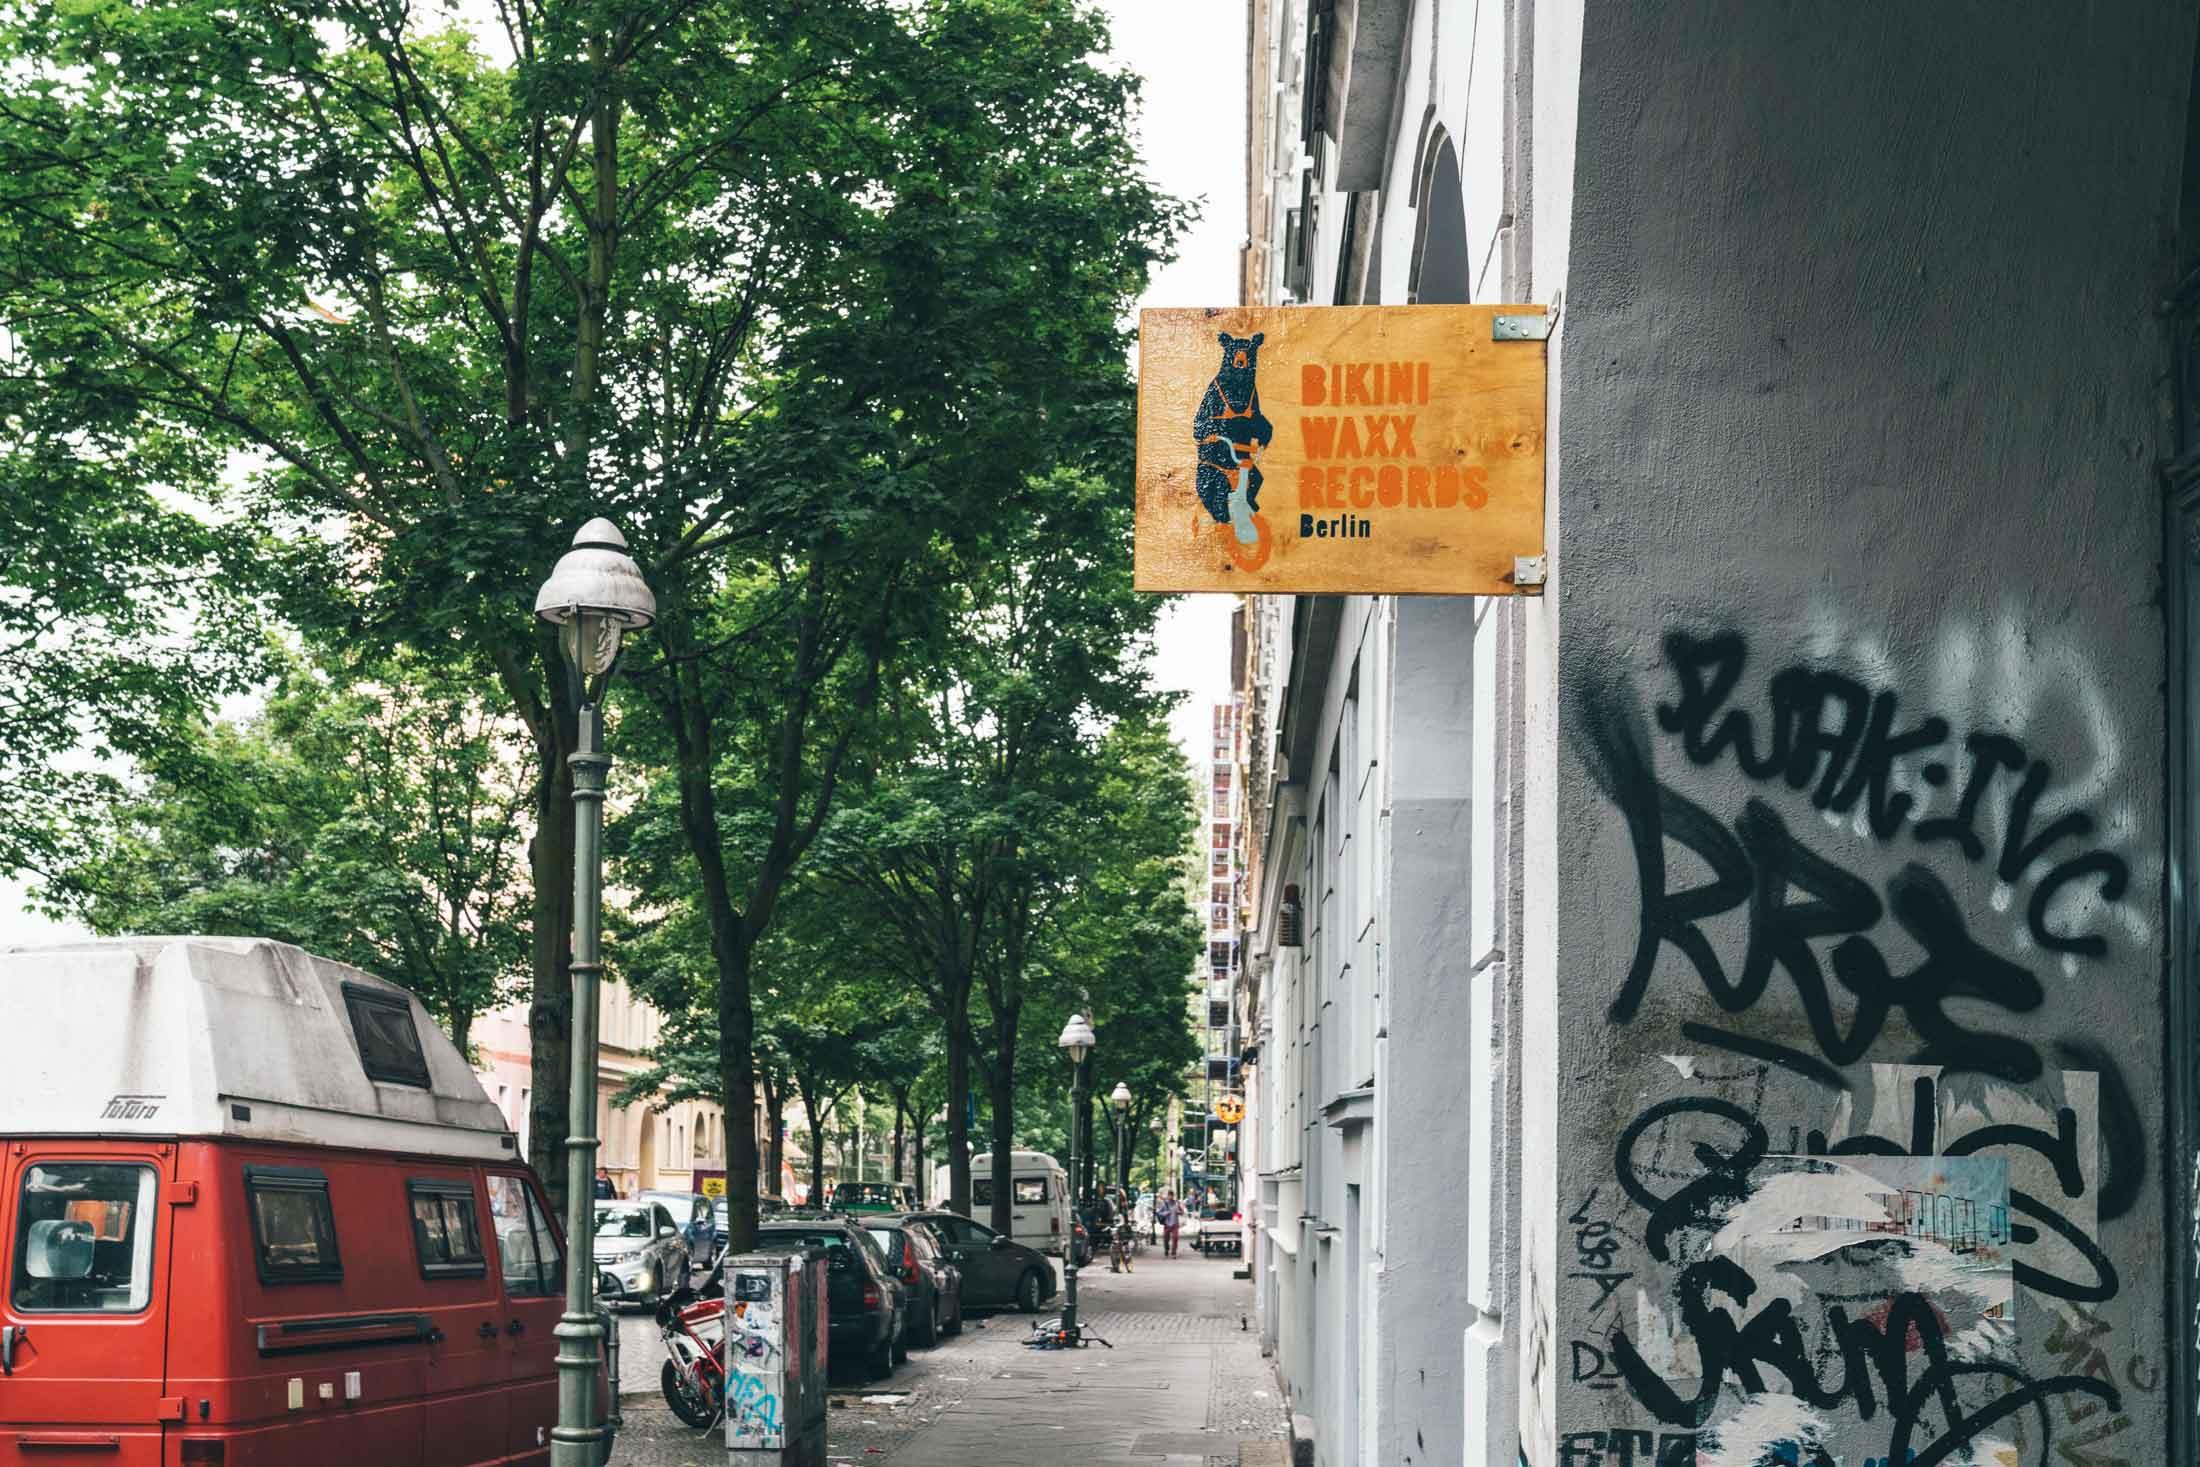 Bikini Waxx Records Berlin Kreuzberg House Deep Detroit Classix Oldschool Rominimal Trippy Acid Electro Dubby Lo-fi Psychotropic Disco Jazz Soul Techno